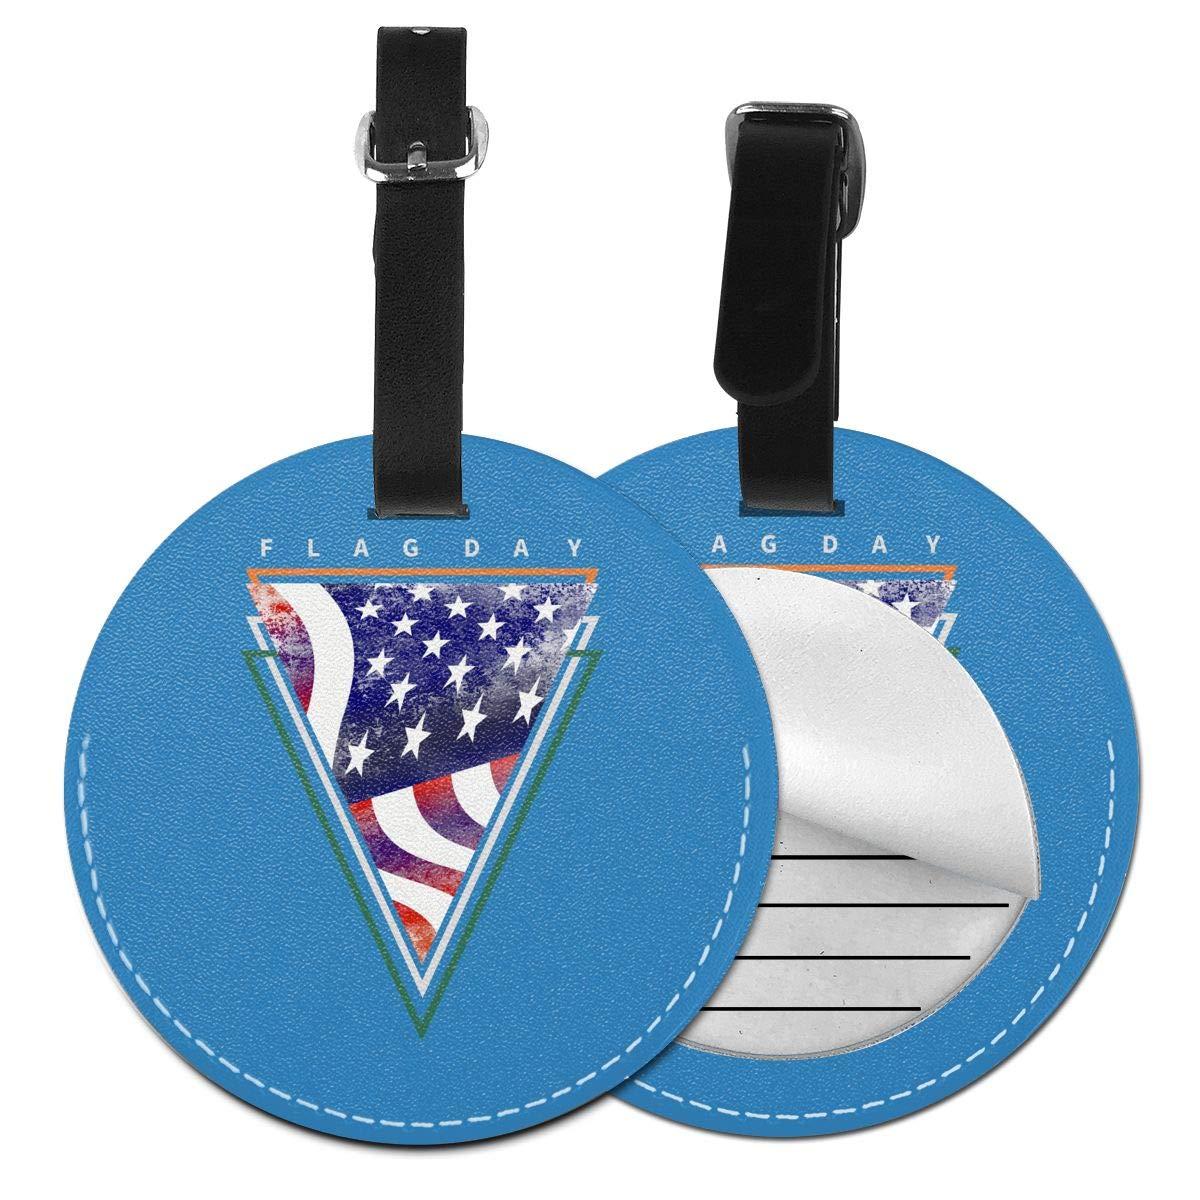 1pcs,2pcs,4pcs Celebrate Irish Heart American Flag Day Pu Leather Double Sides Print Round Luggage Tag Mutilple Packs